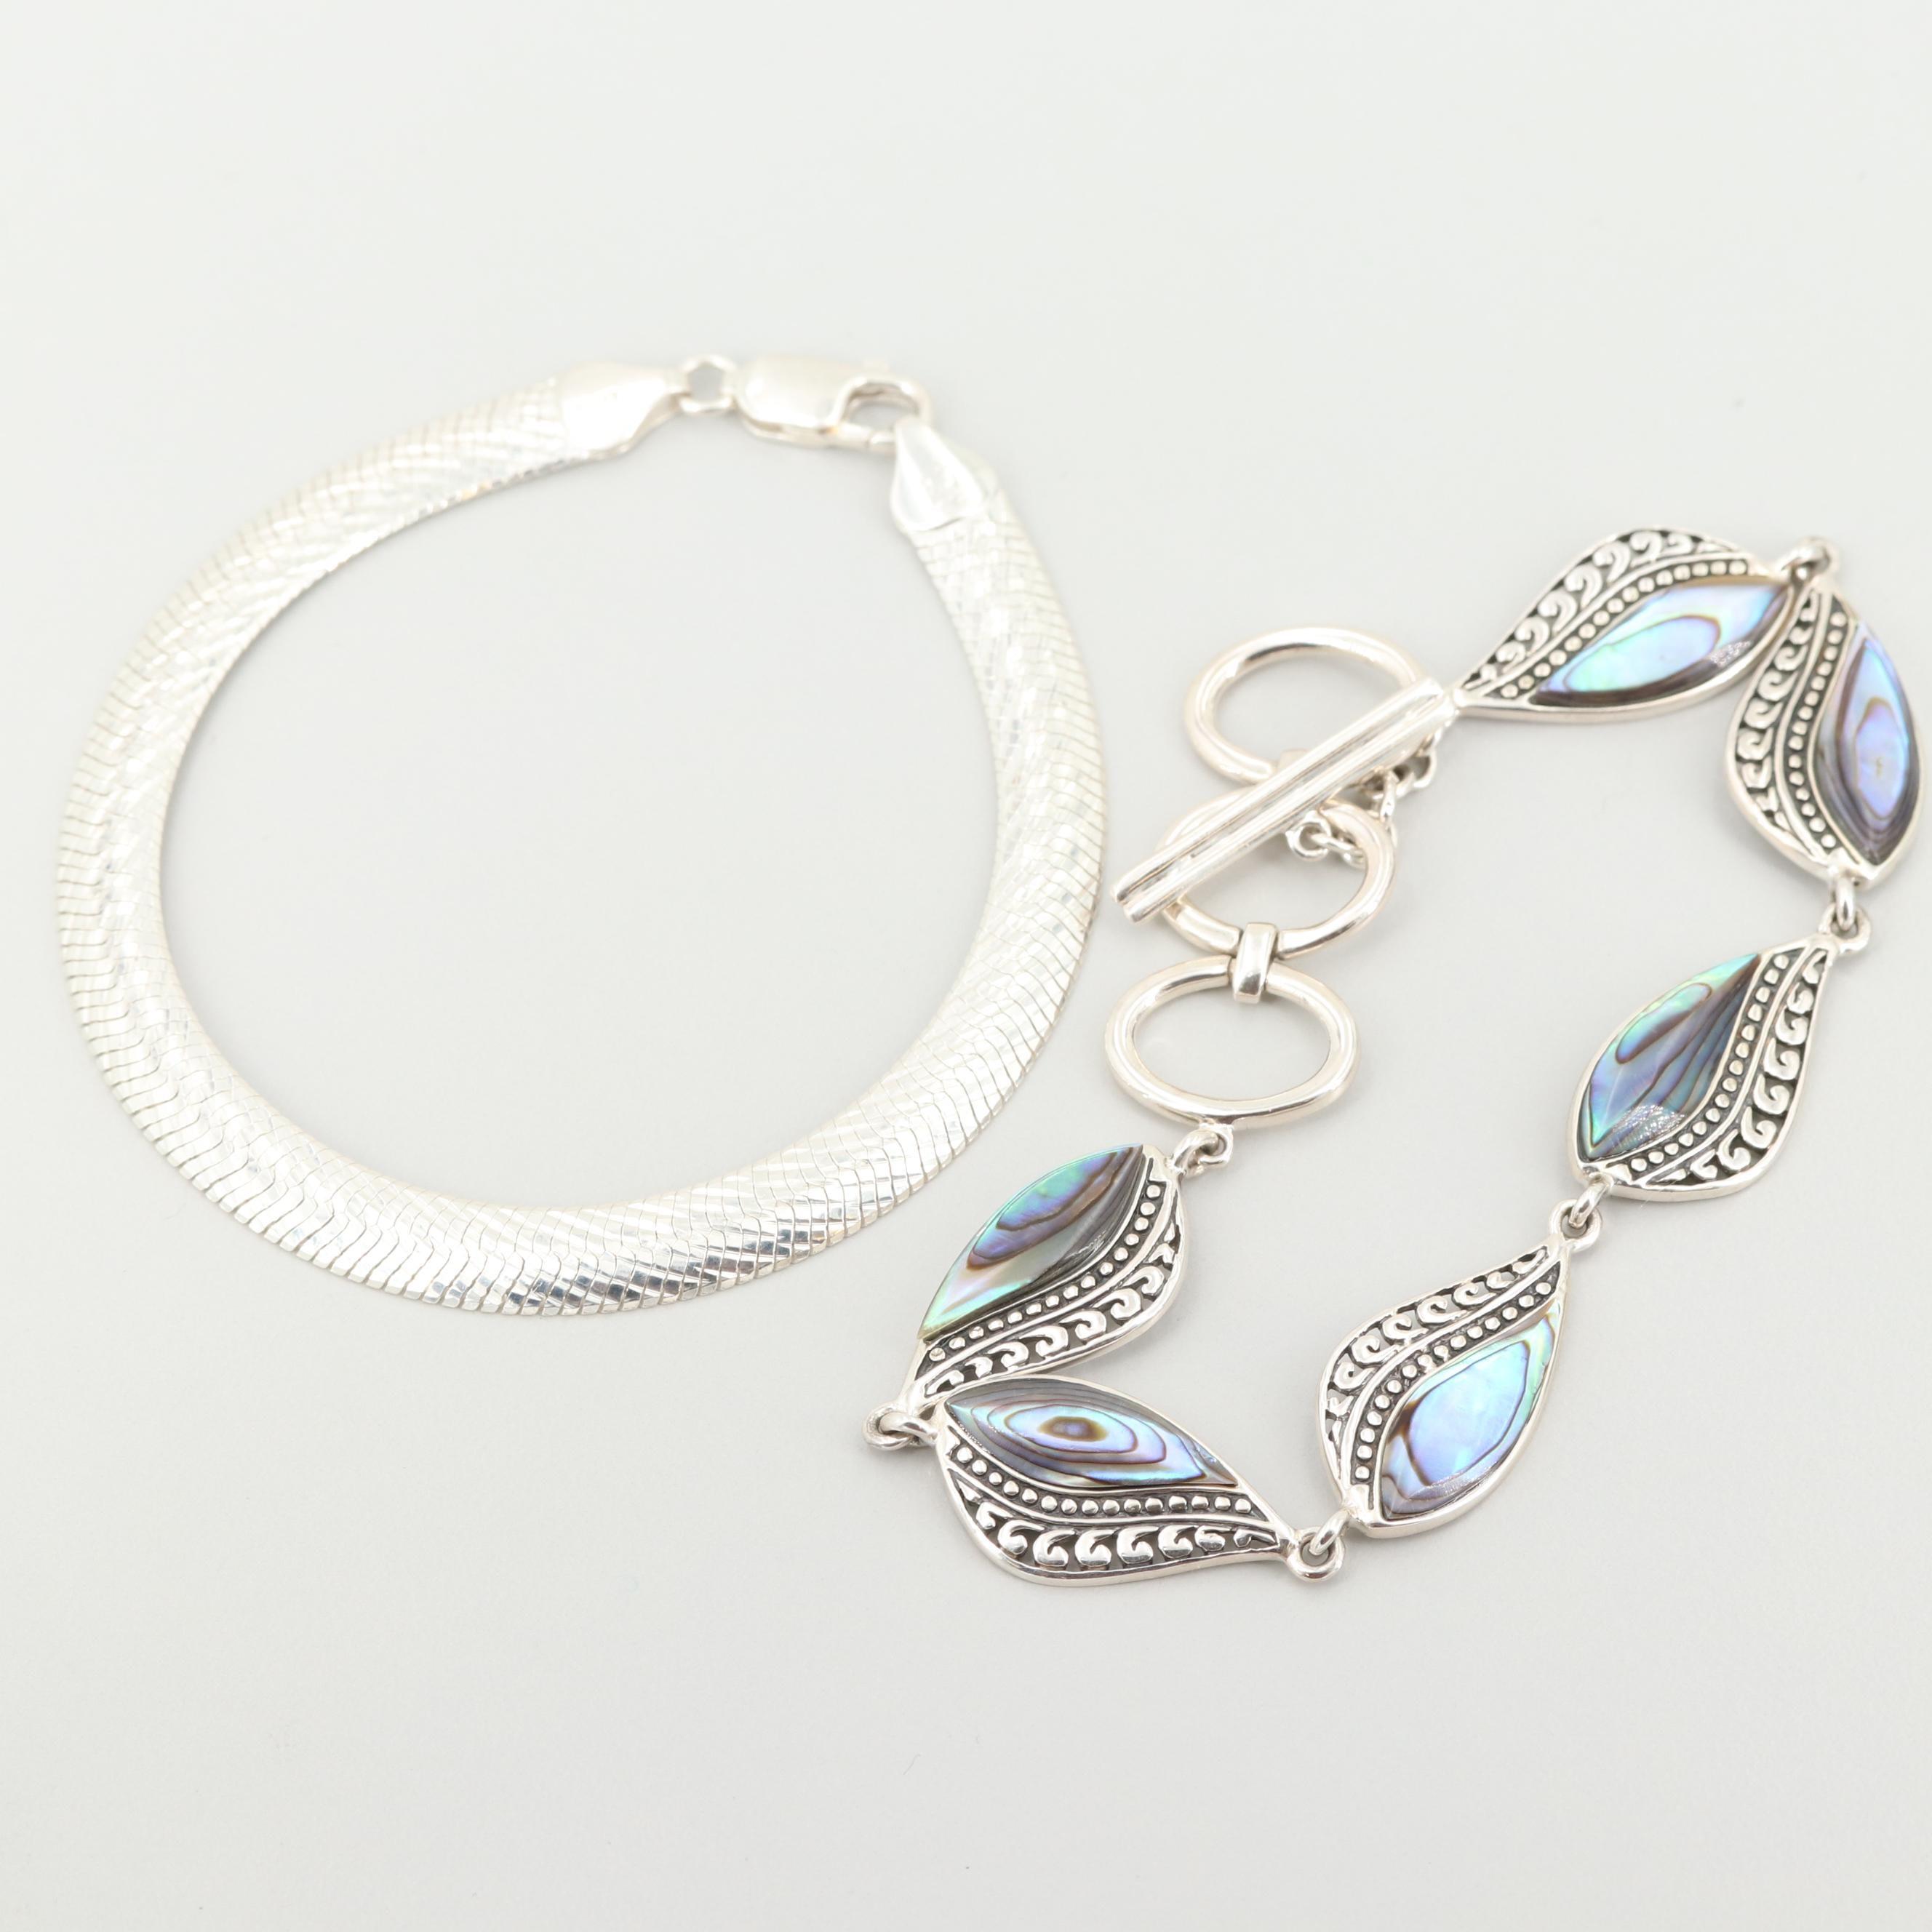 Sterling Silver Abalone Link Bracelet and Mesh Bracelet